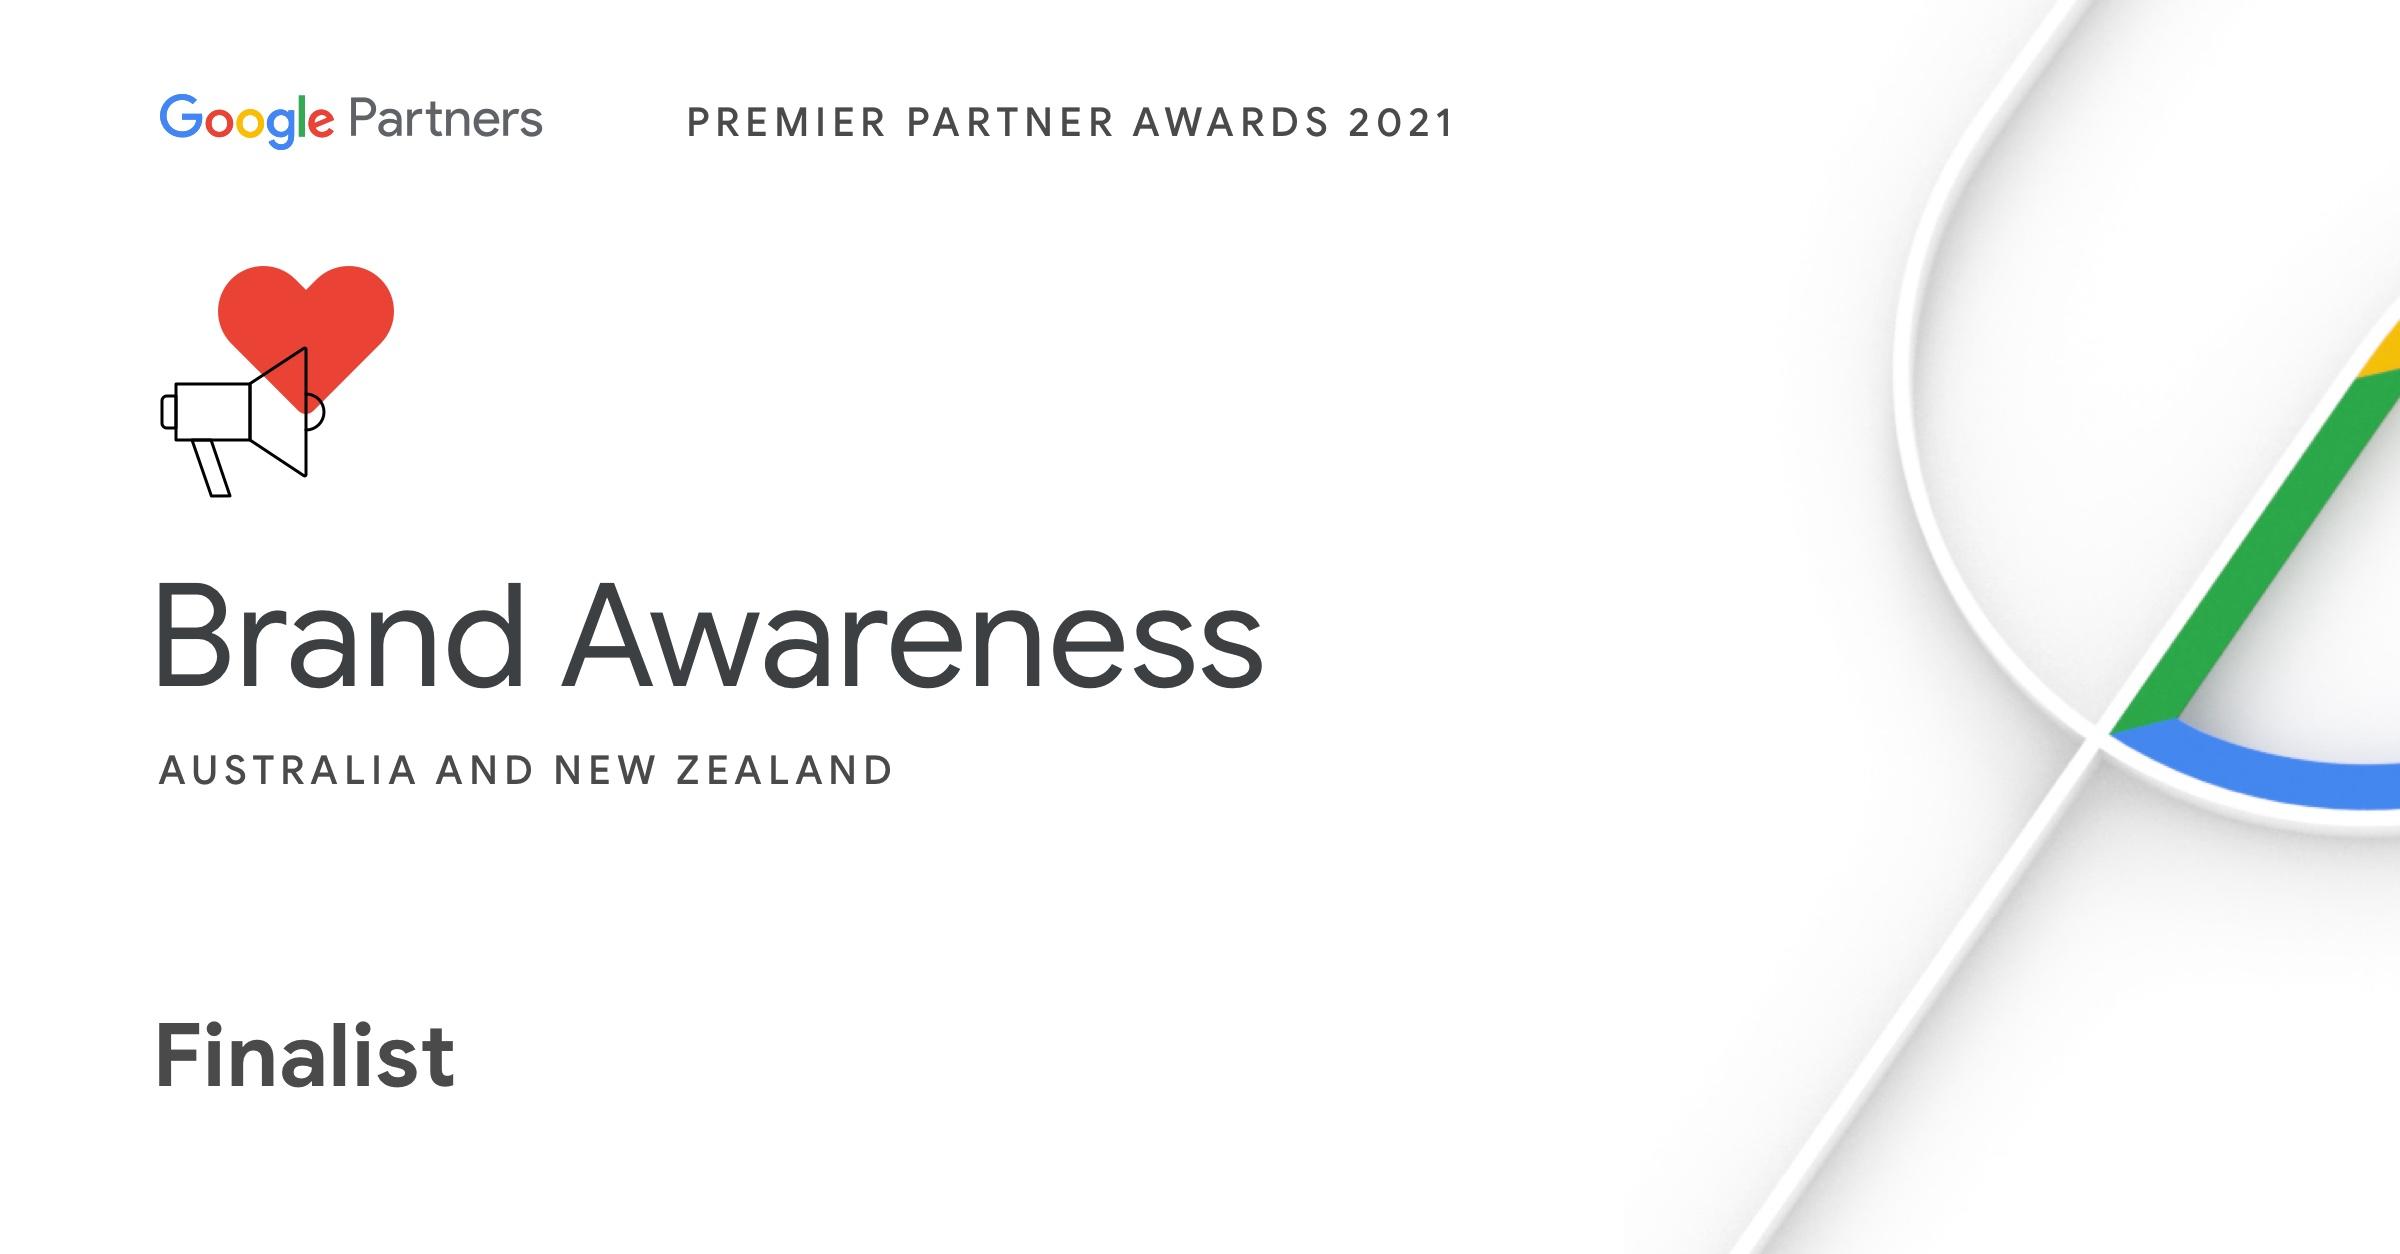 In Marketing We Trust named Google Premier Partner of the Year finalist